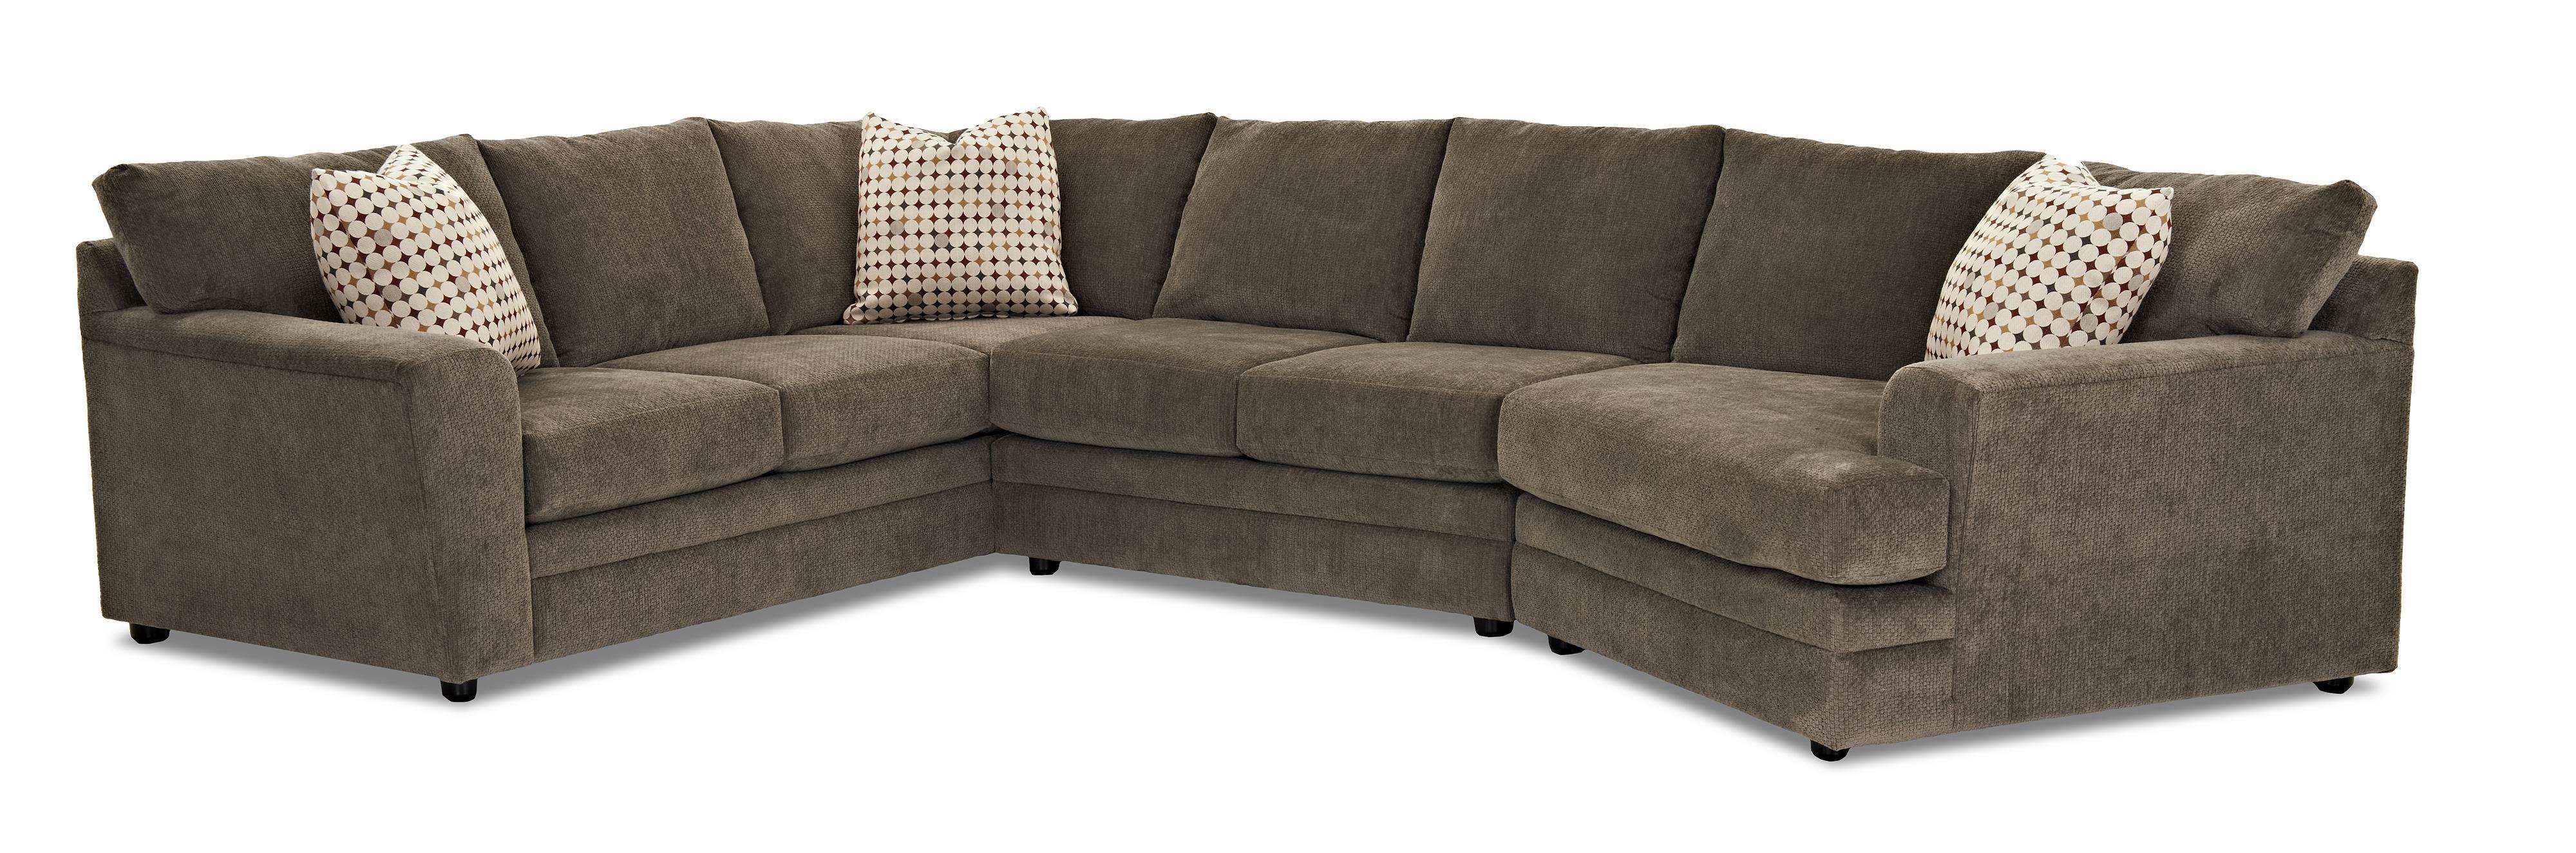 klaussner ashburn casual sectional sofa group olinde 39 s furniture sectional sofas. Black Bedroom Furniture Sets. Home Design Ideas